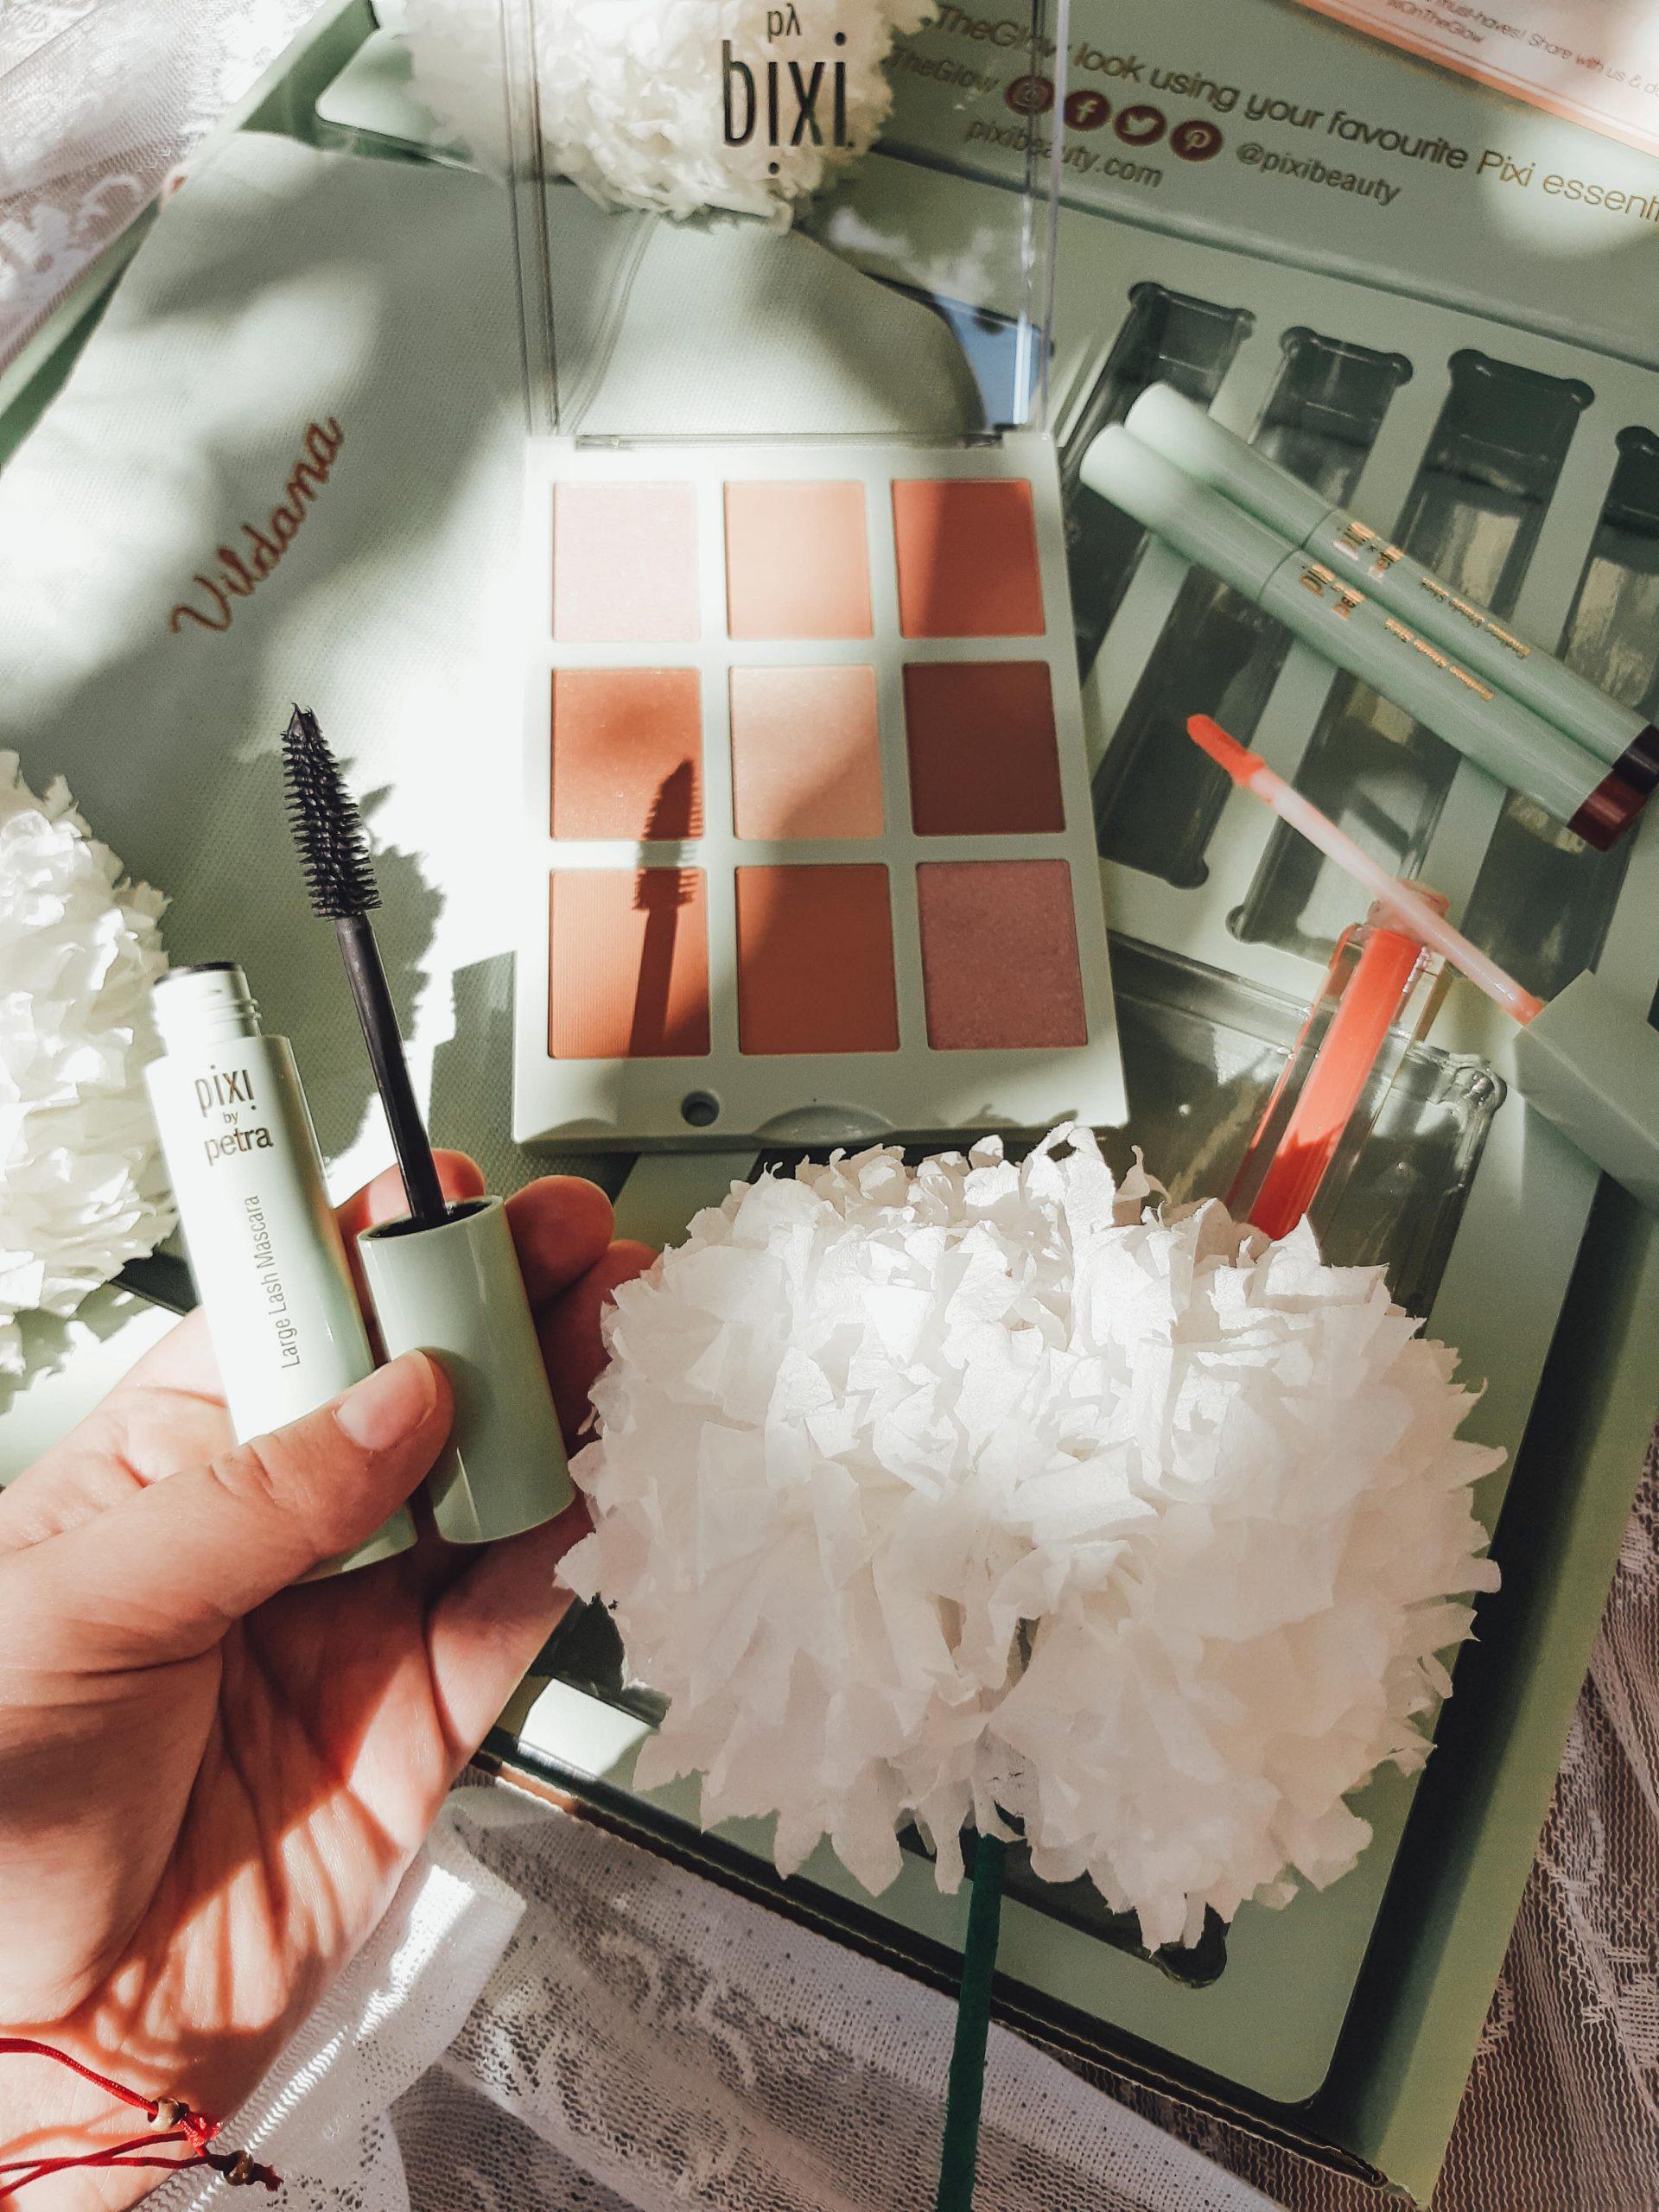 pixi beauty pr package unboxing livinglikev fashion blogger pixi review